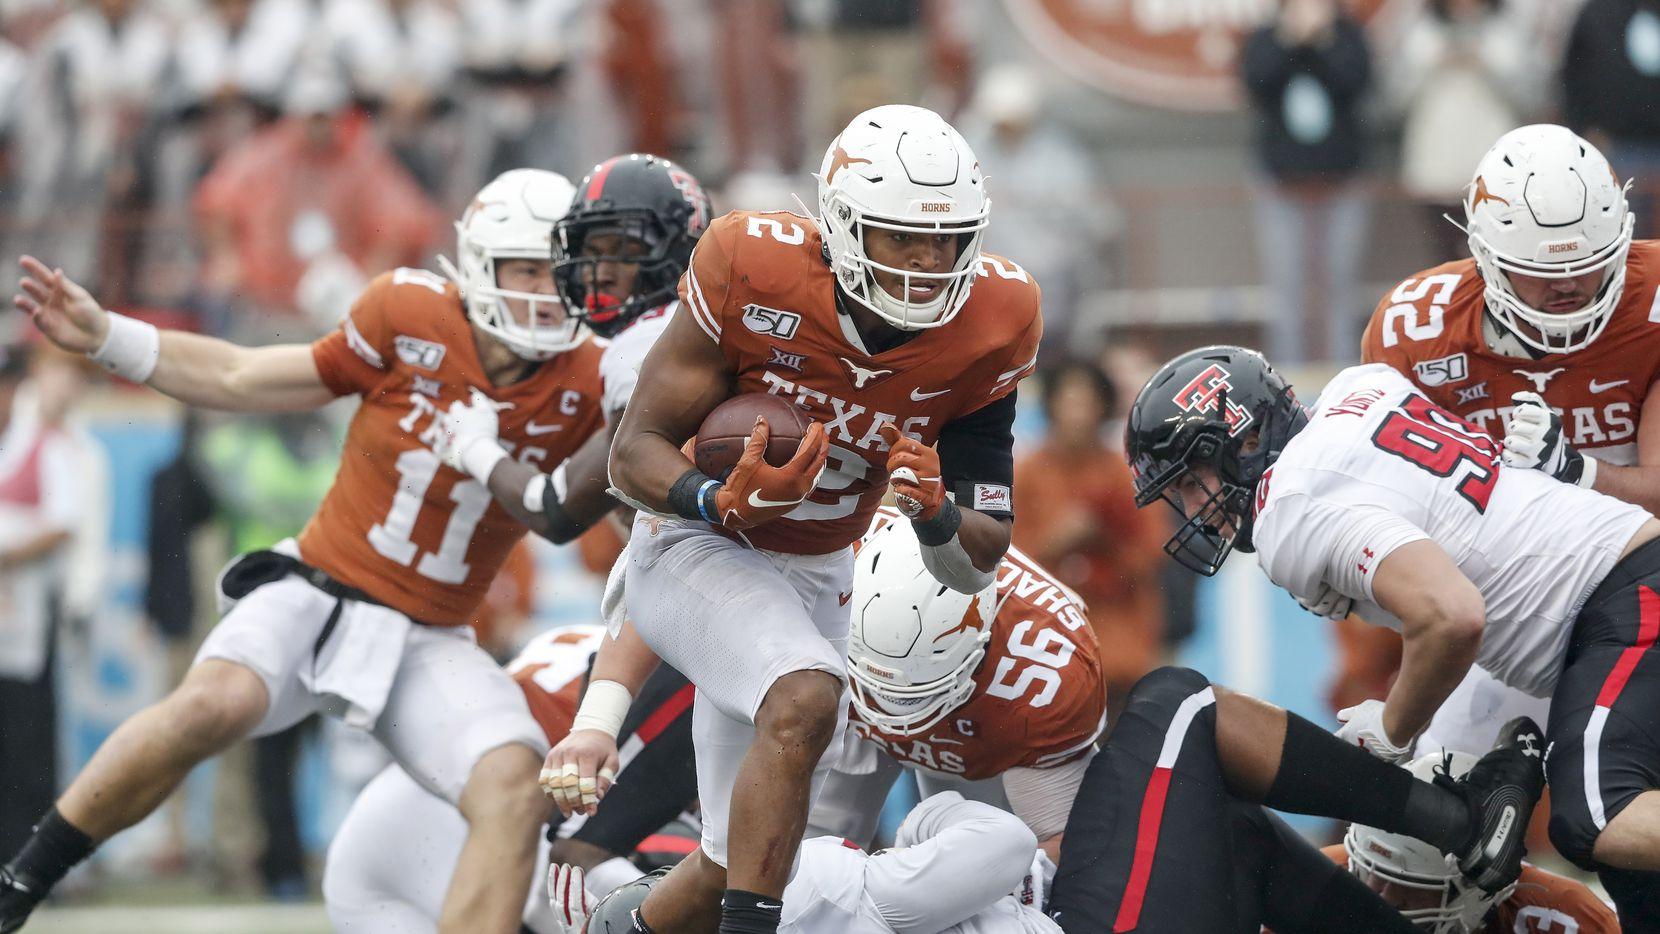 AUSTIN, TX - NOVEMBER 29:  Roschon Johnson #2 of the Texas Longhorns rushes for a touchdown in the fourth quarter against the Texas Tech Red Raiders at Darrell K Royal-Texas Memorial Stadium on November 29, 2019 in Austin, Texas.